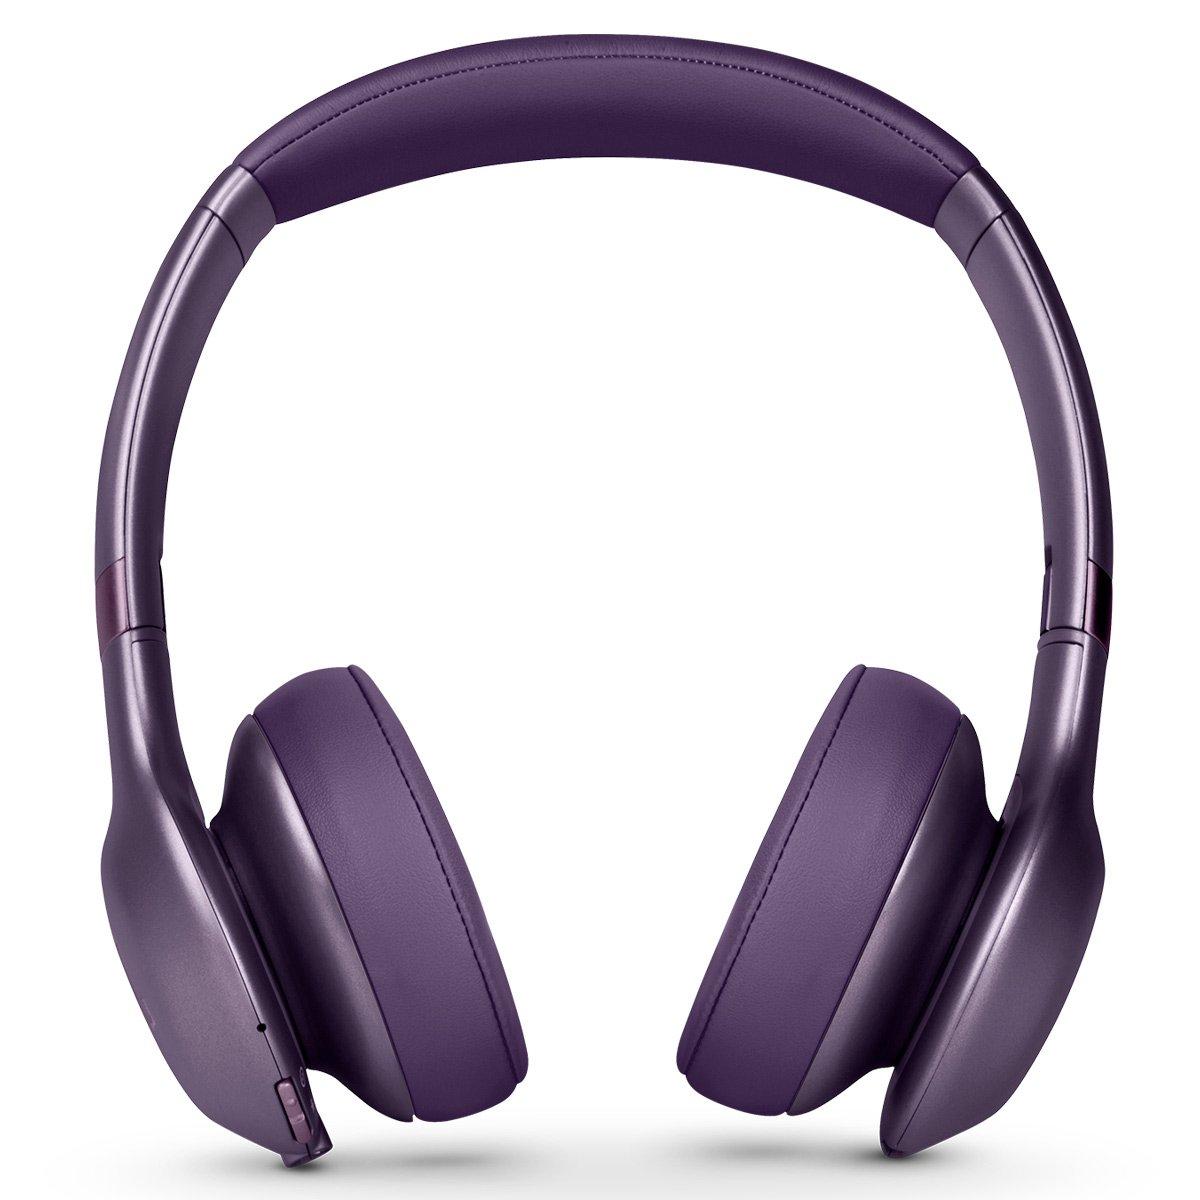 JBL V310BTPUR Everest 310 Wireless On-Ear Headphones (Purple)